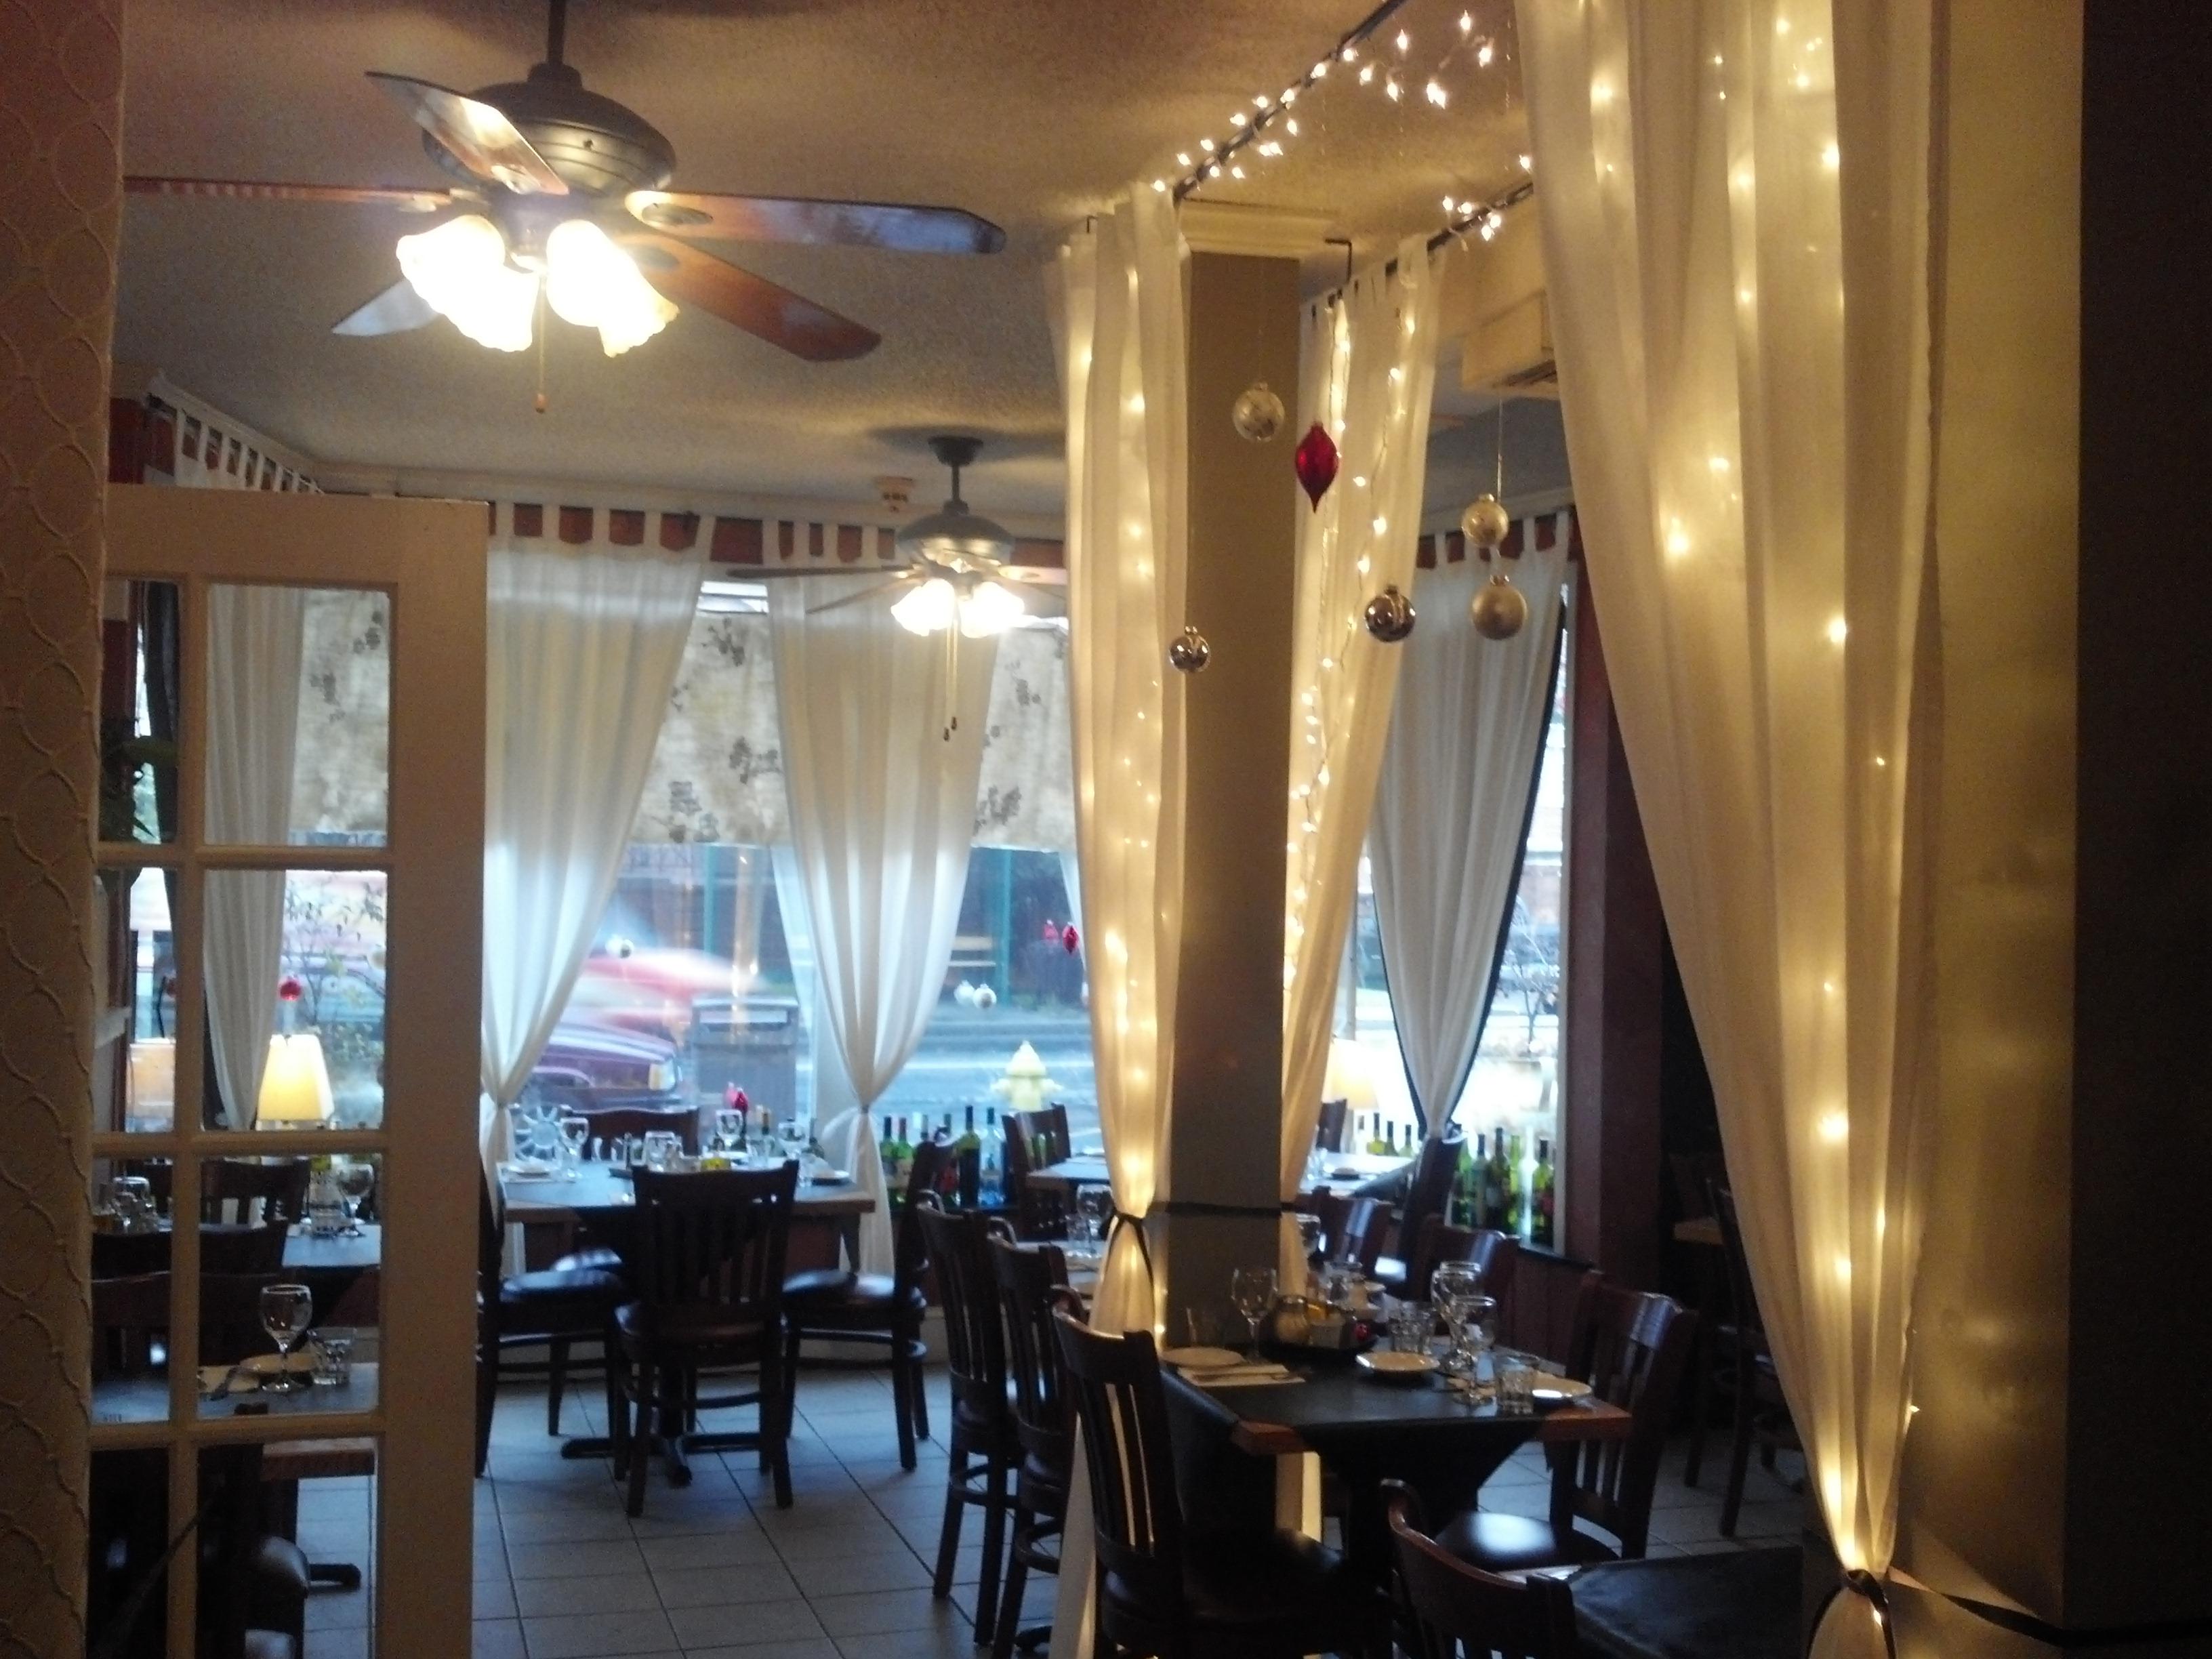 River Street Restaurant 109 River Street Milford Ct 06460